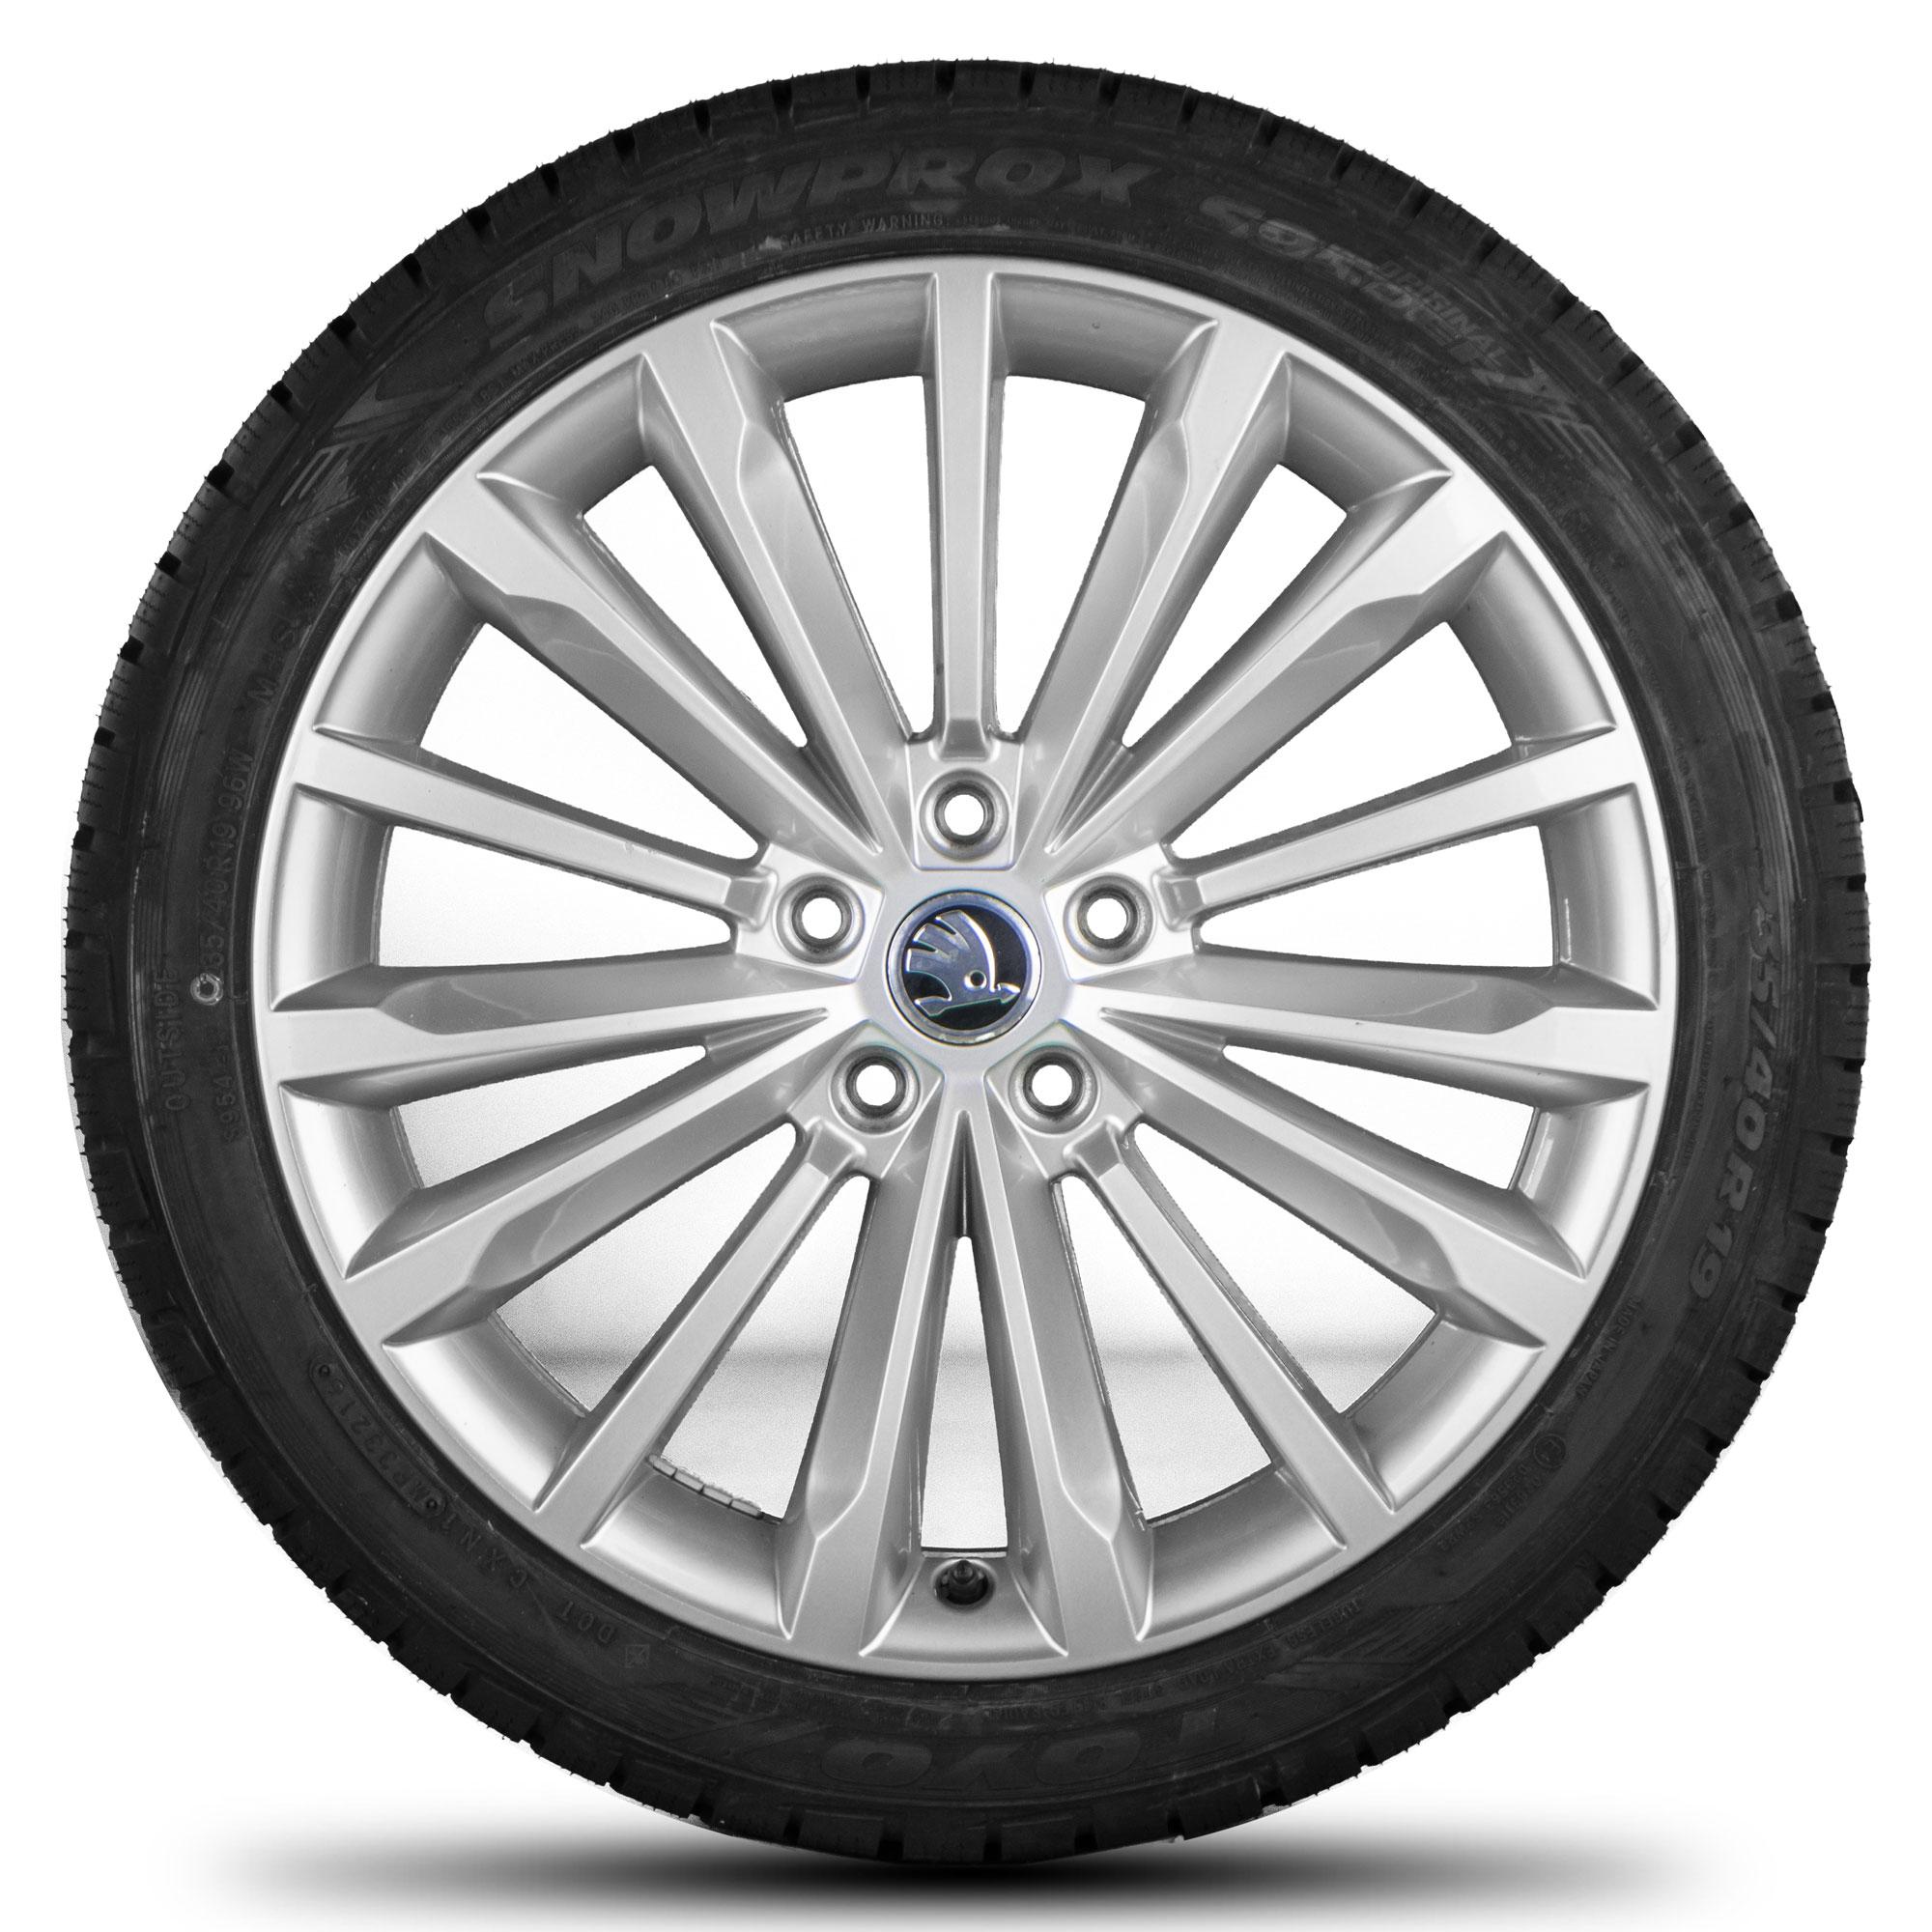 skoda 19 inch rims superb 3v phoenix alloy wheels winter. Black Bedroom Furniture Sets. Home Design Ideas